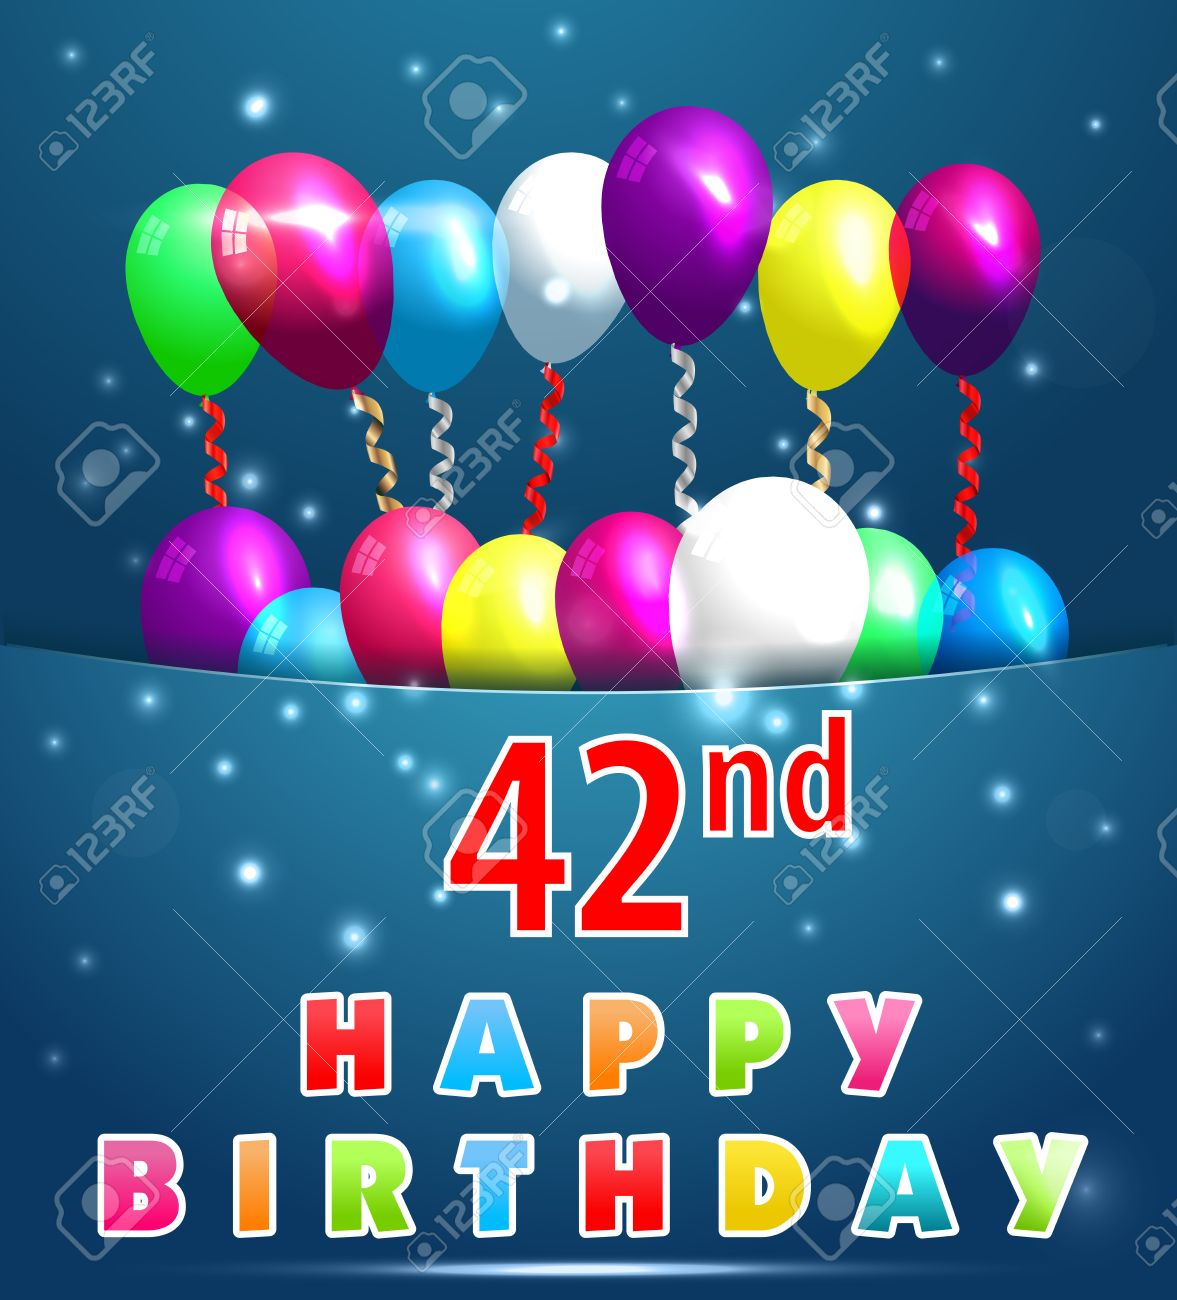 Birthday Geburtstags Shop 1978 Geboren 42 Geburtstag 42